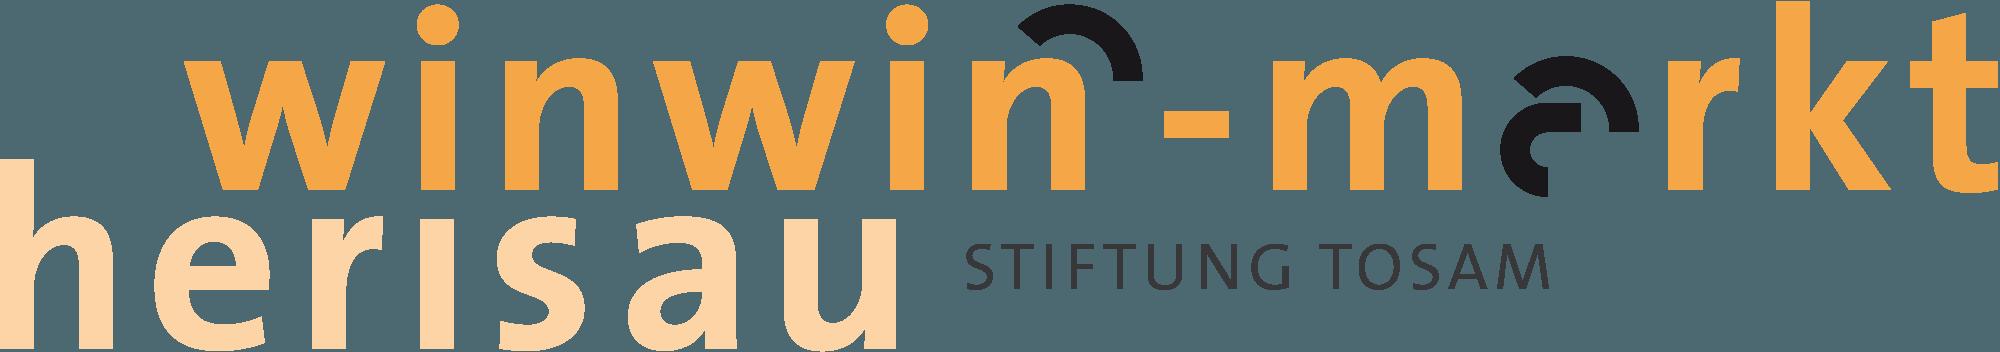 WinWin-Markt Herisau Stiftung Tosam